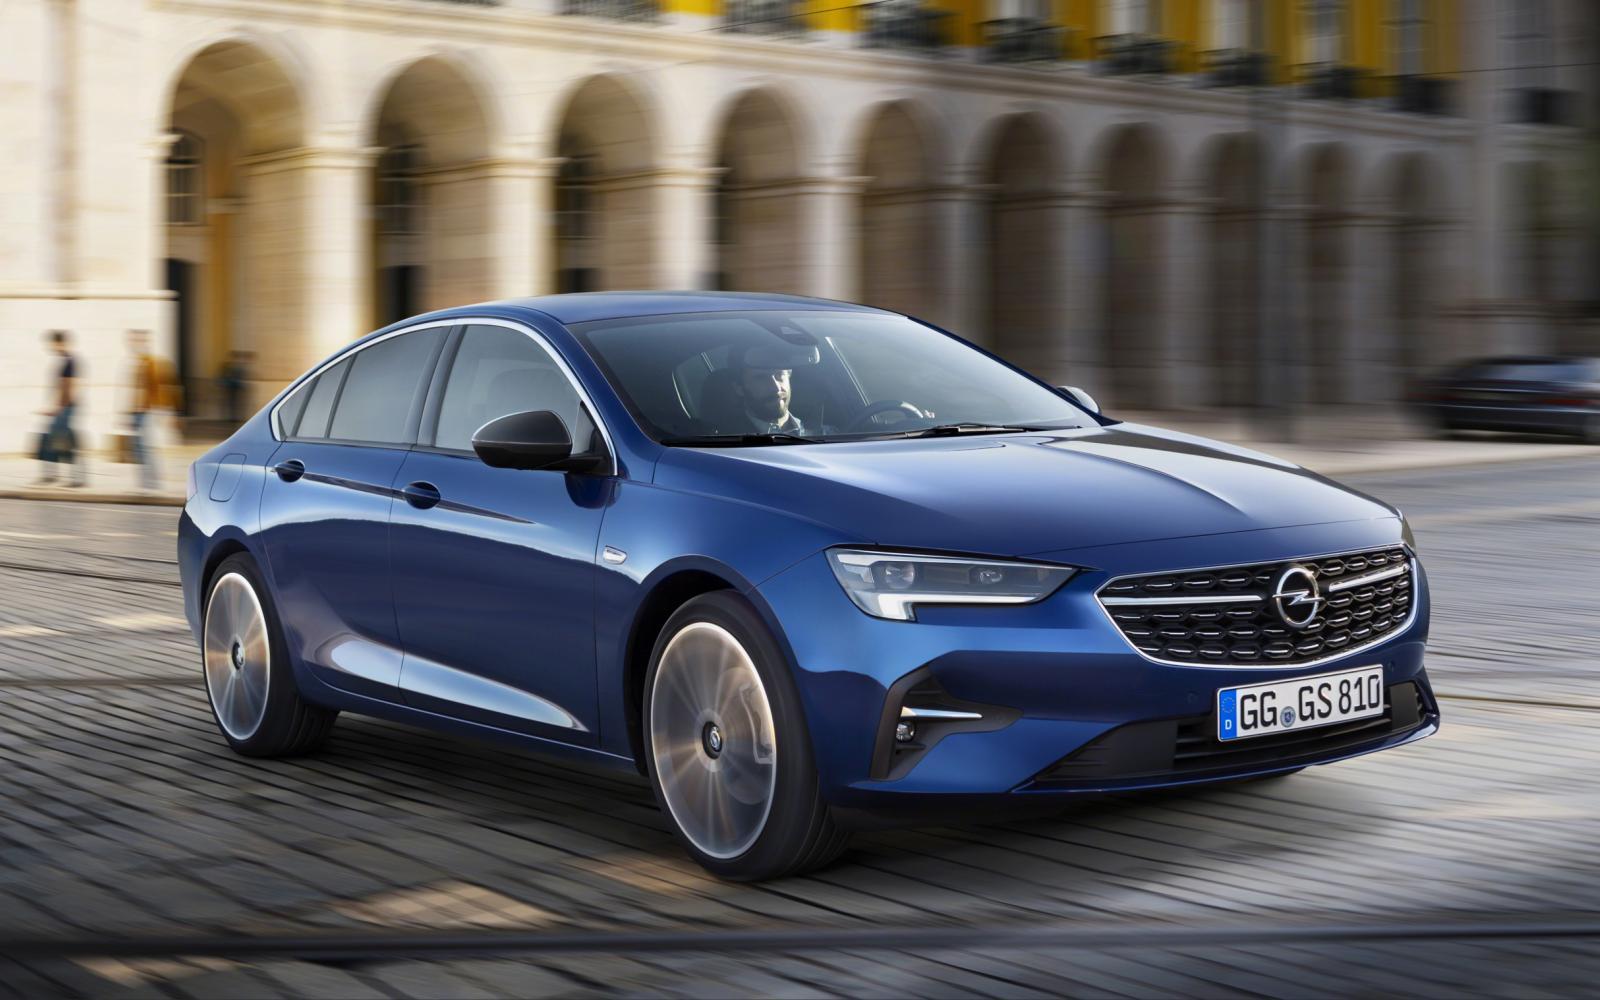 Bescheiden facelift voor de Opel Insignia is bescheiden